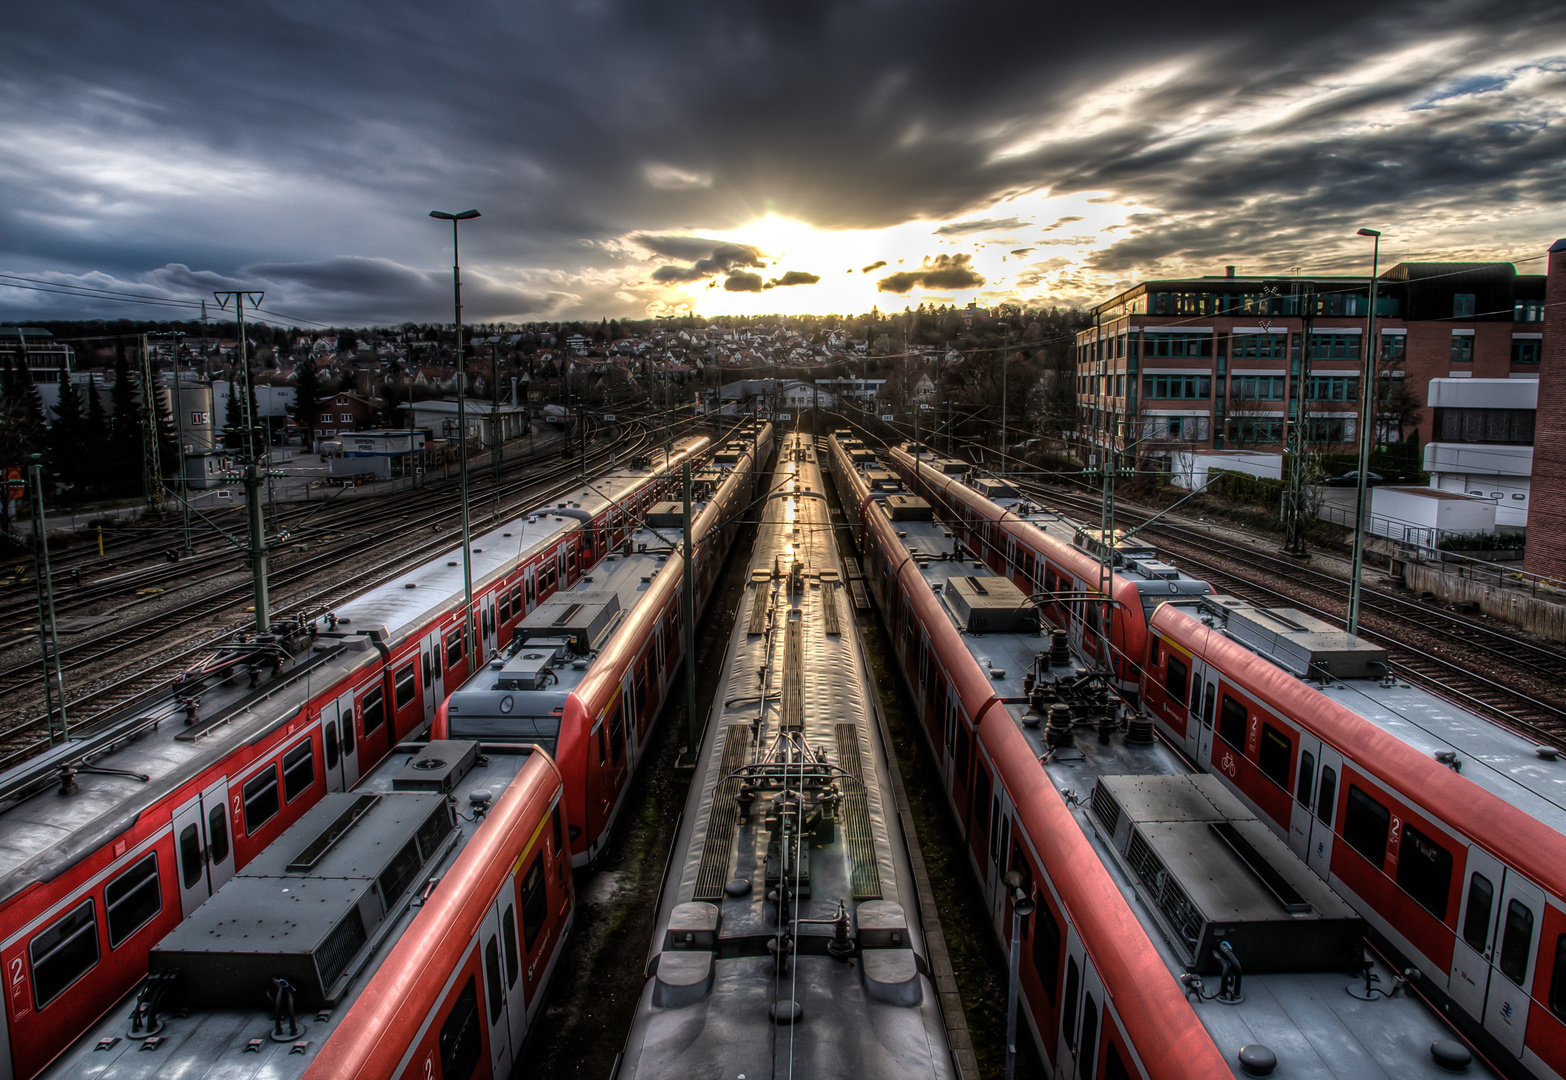 A commuter train's weekend